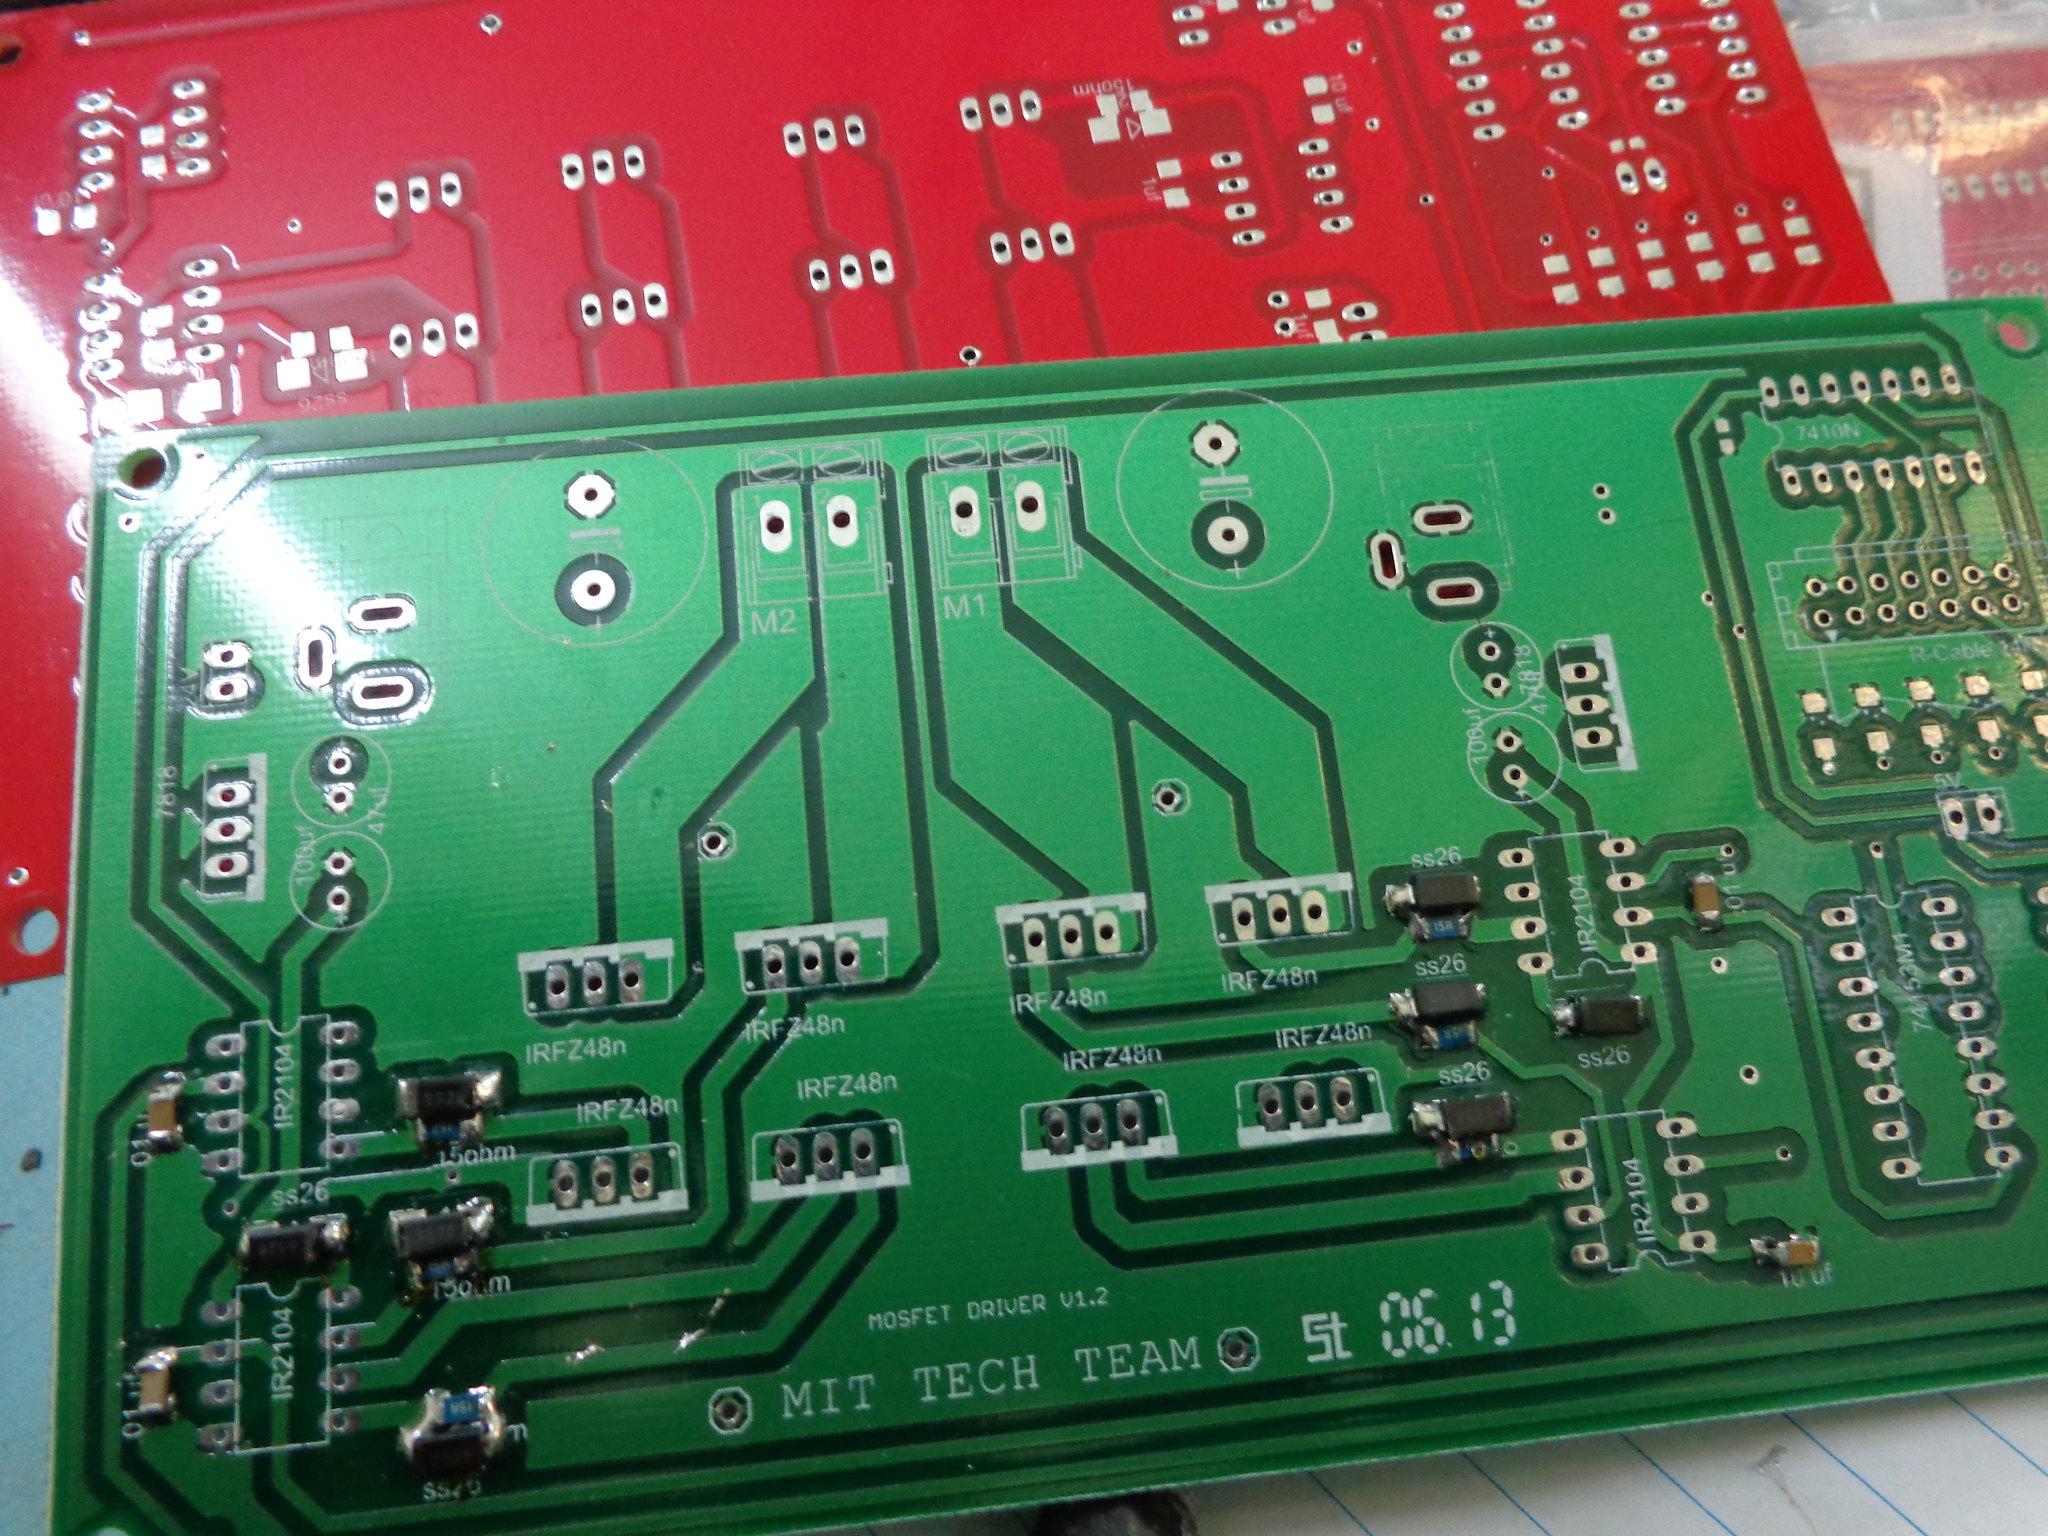 Brand new PCBs